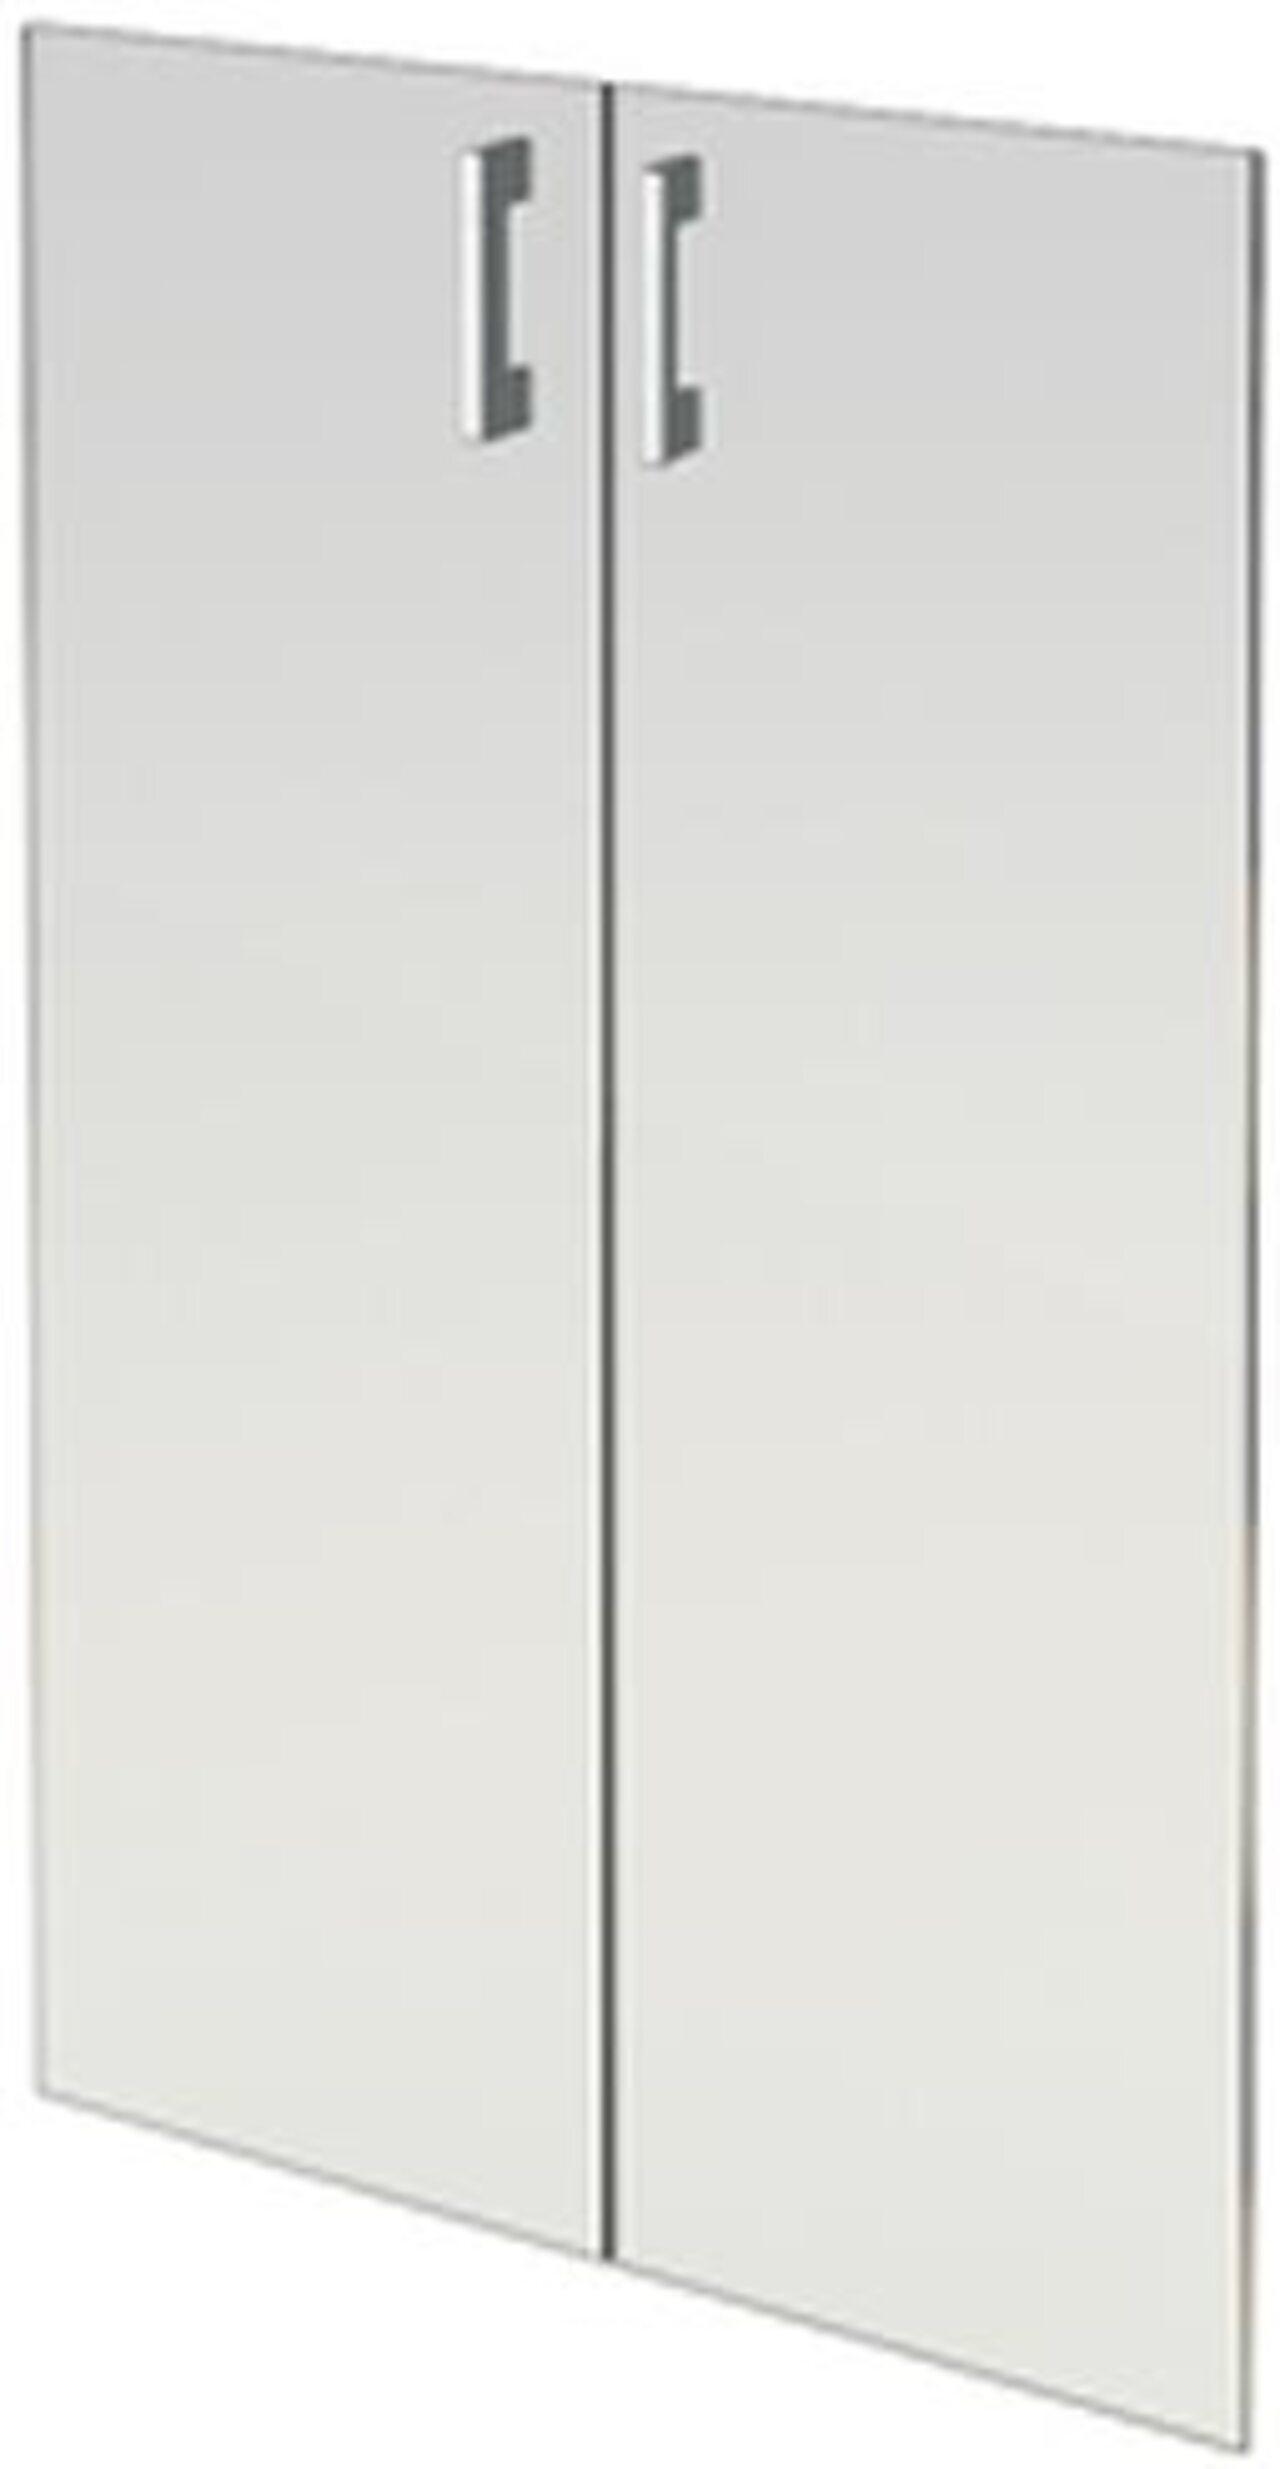 Комплект стеклянных дверей  Арго 71x1x112 - фото 2